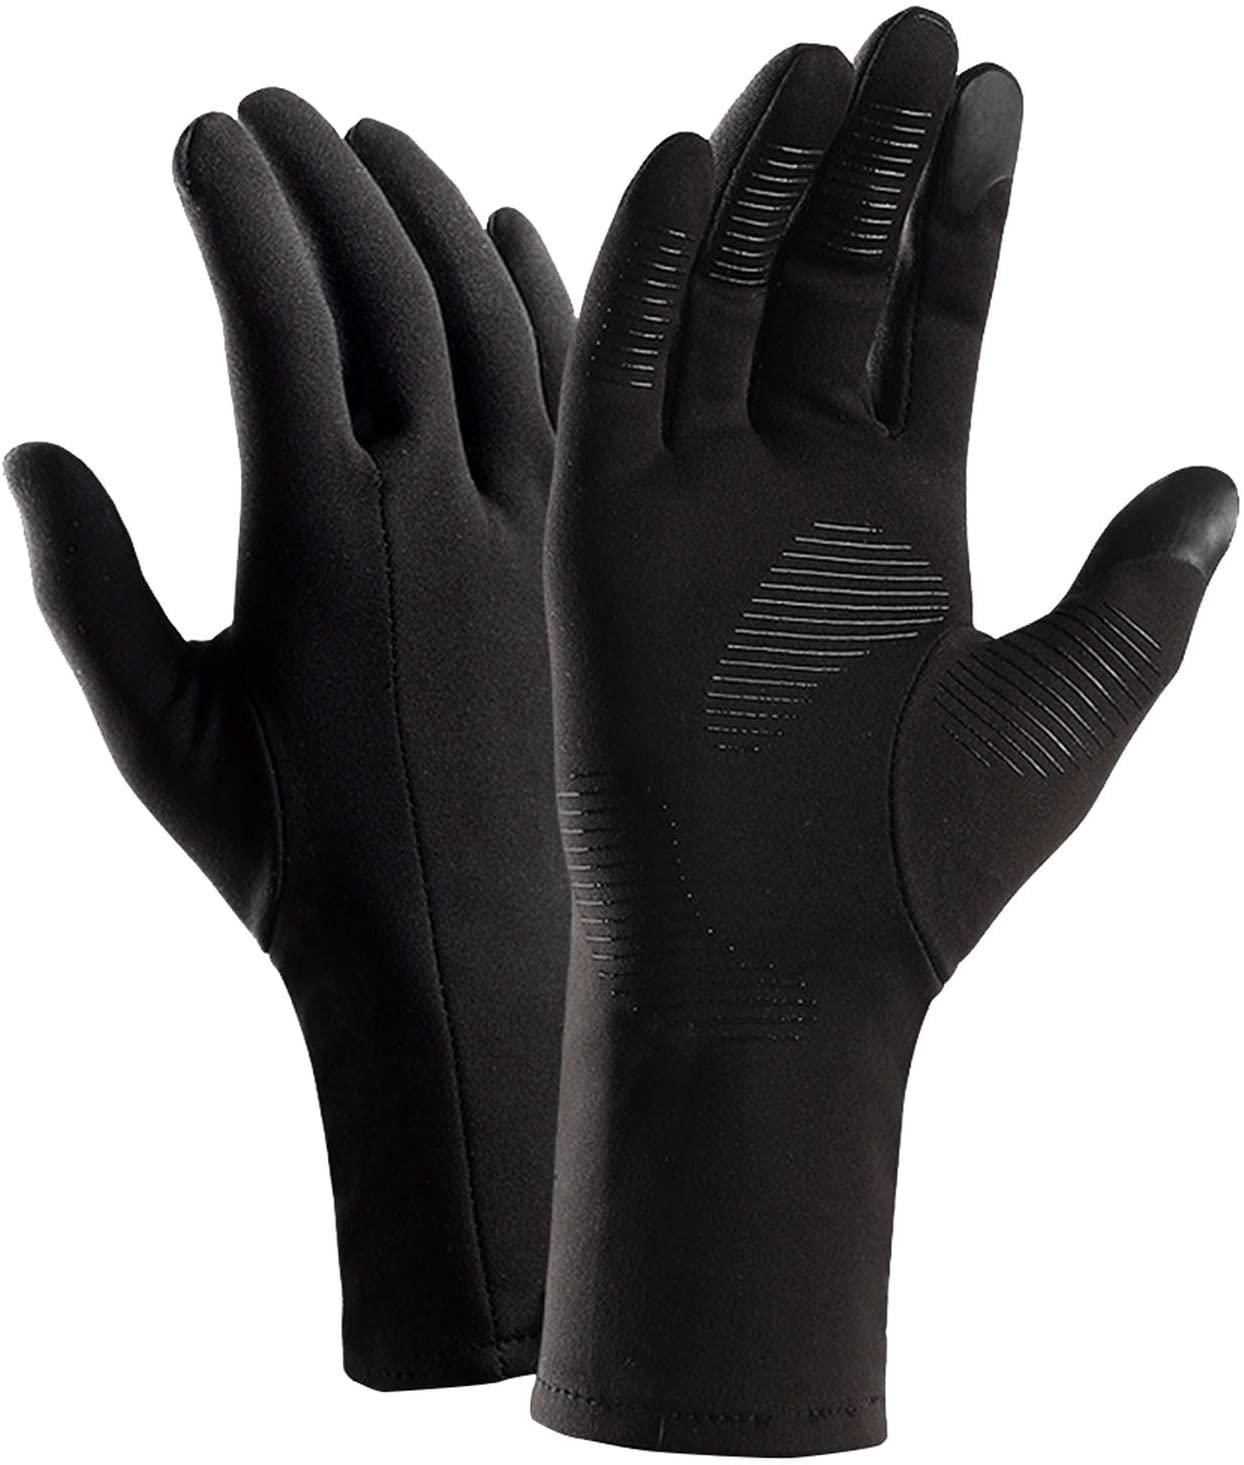 YR5V4V 1 Pair Men Women Windproof Anti Slip Ski Practical Multifunctional Sports Thermal Gloves Bike Gift Warm Skiing Gloves